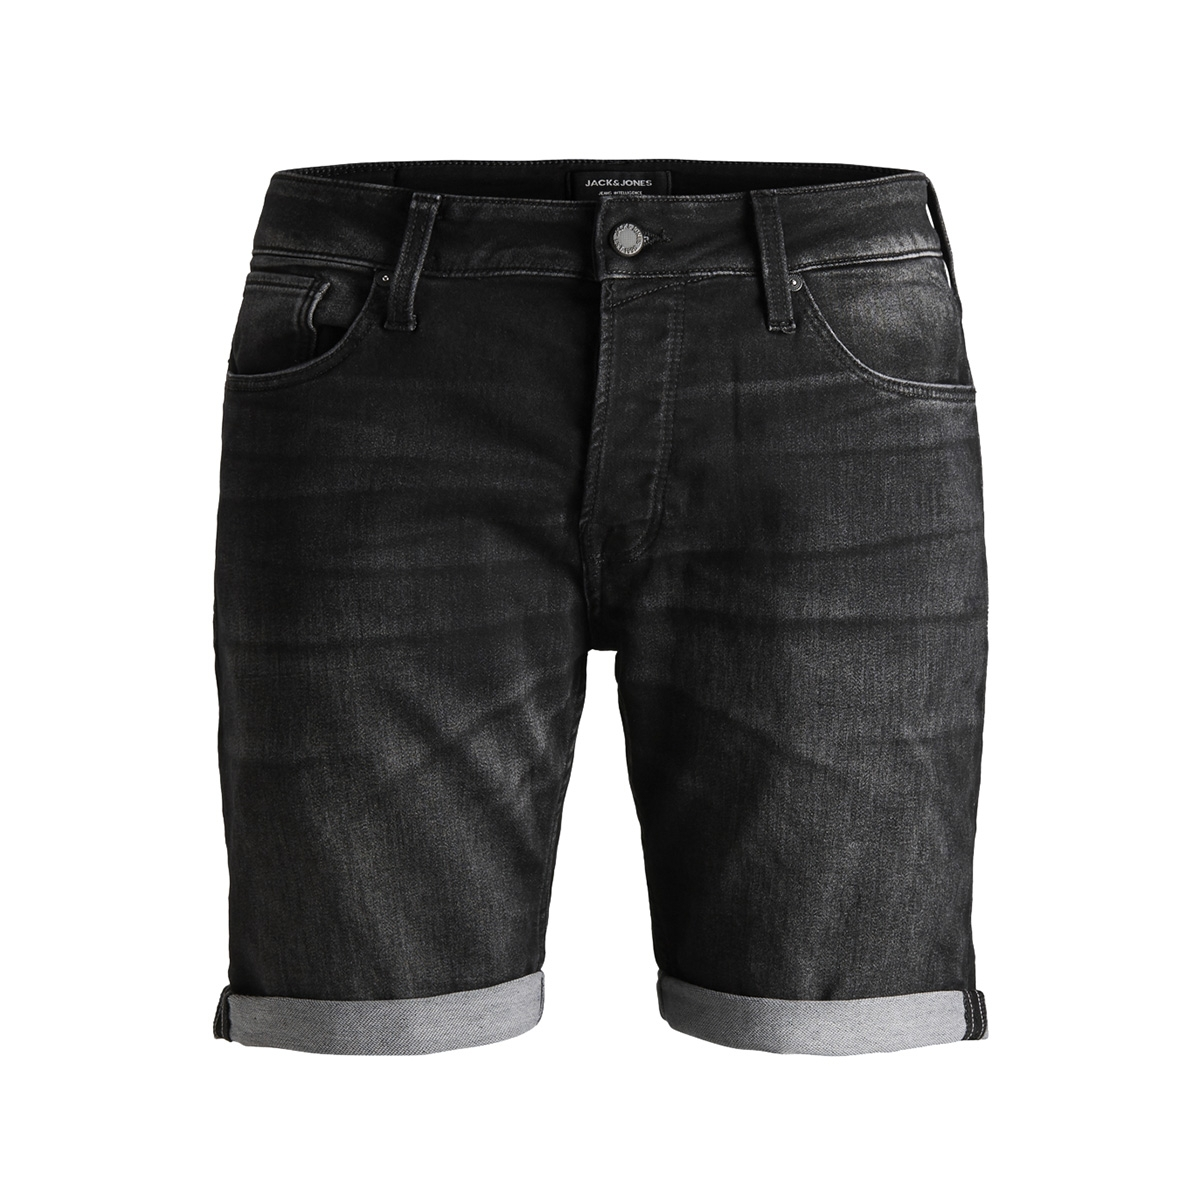 jjirick jjicon shorts ge 853 i.k. s 12147068 jack & jones korte broek black denim